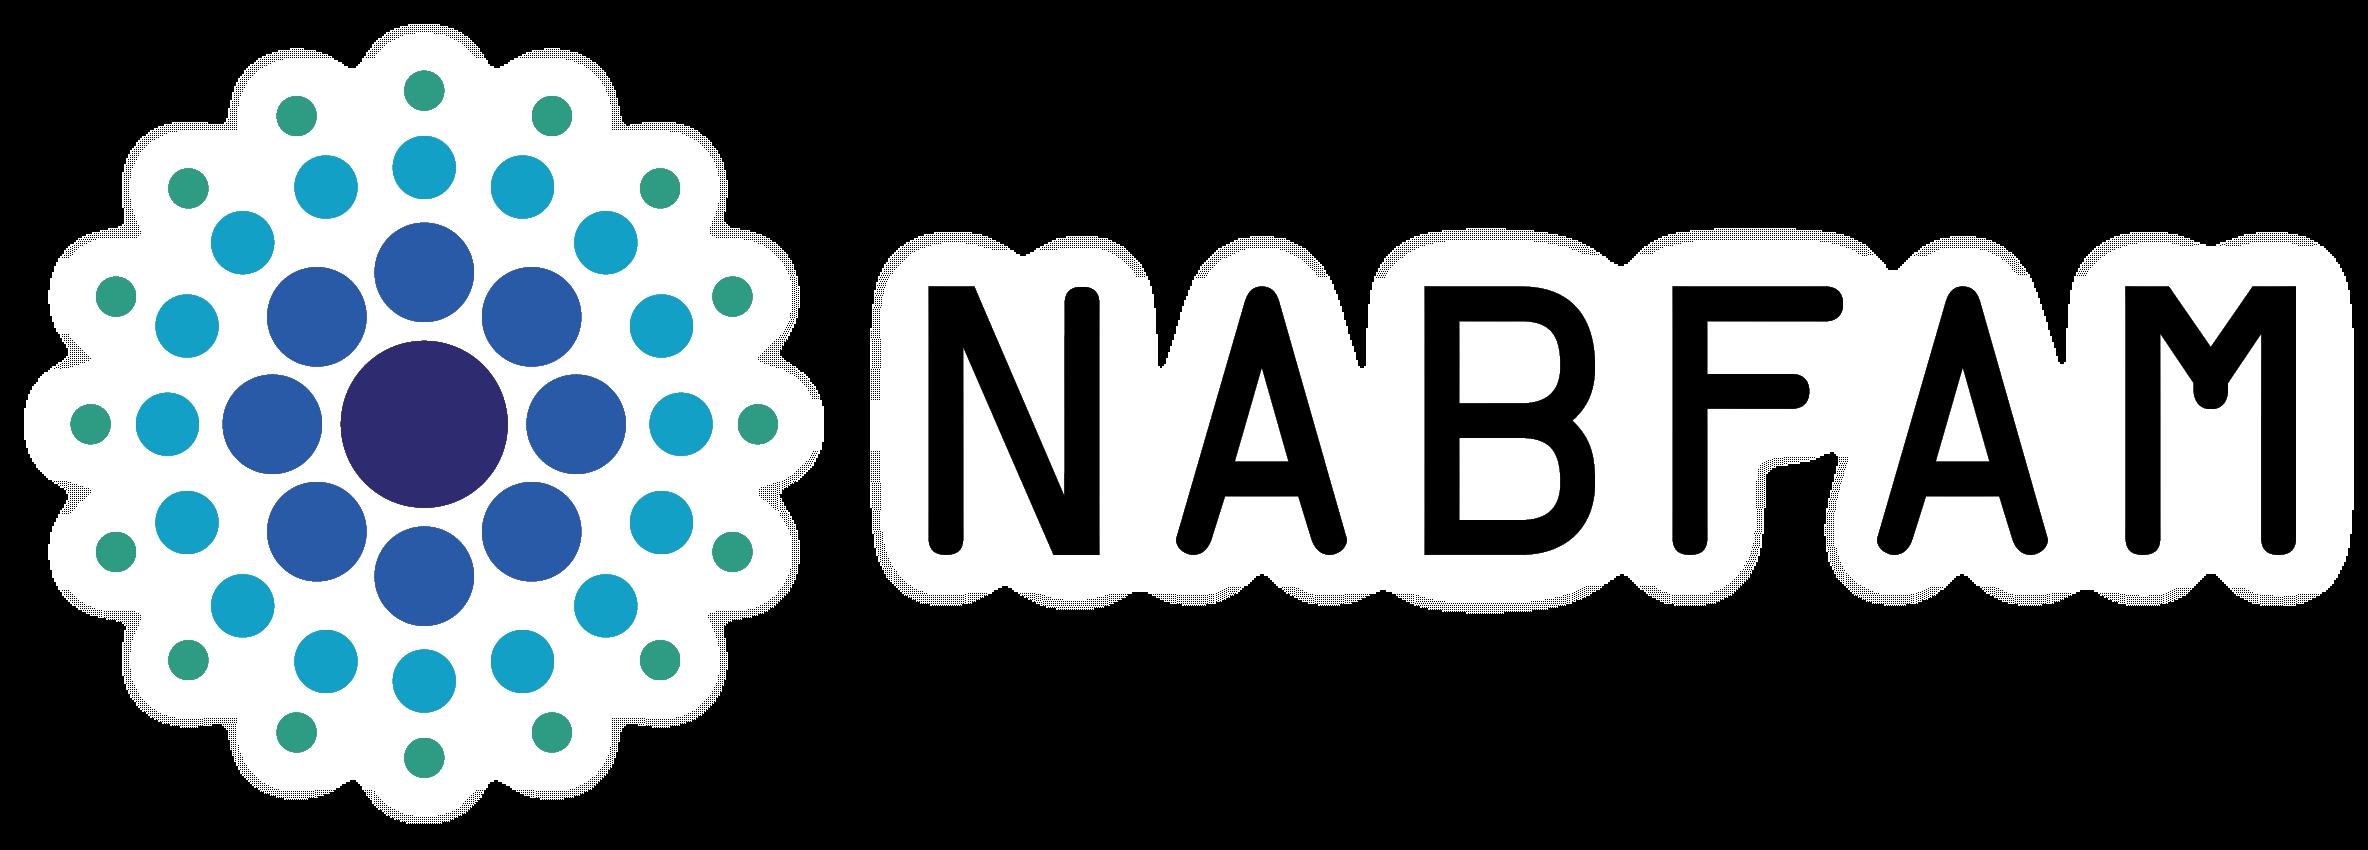 NABFAM